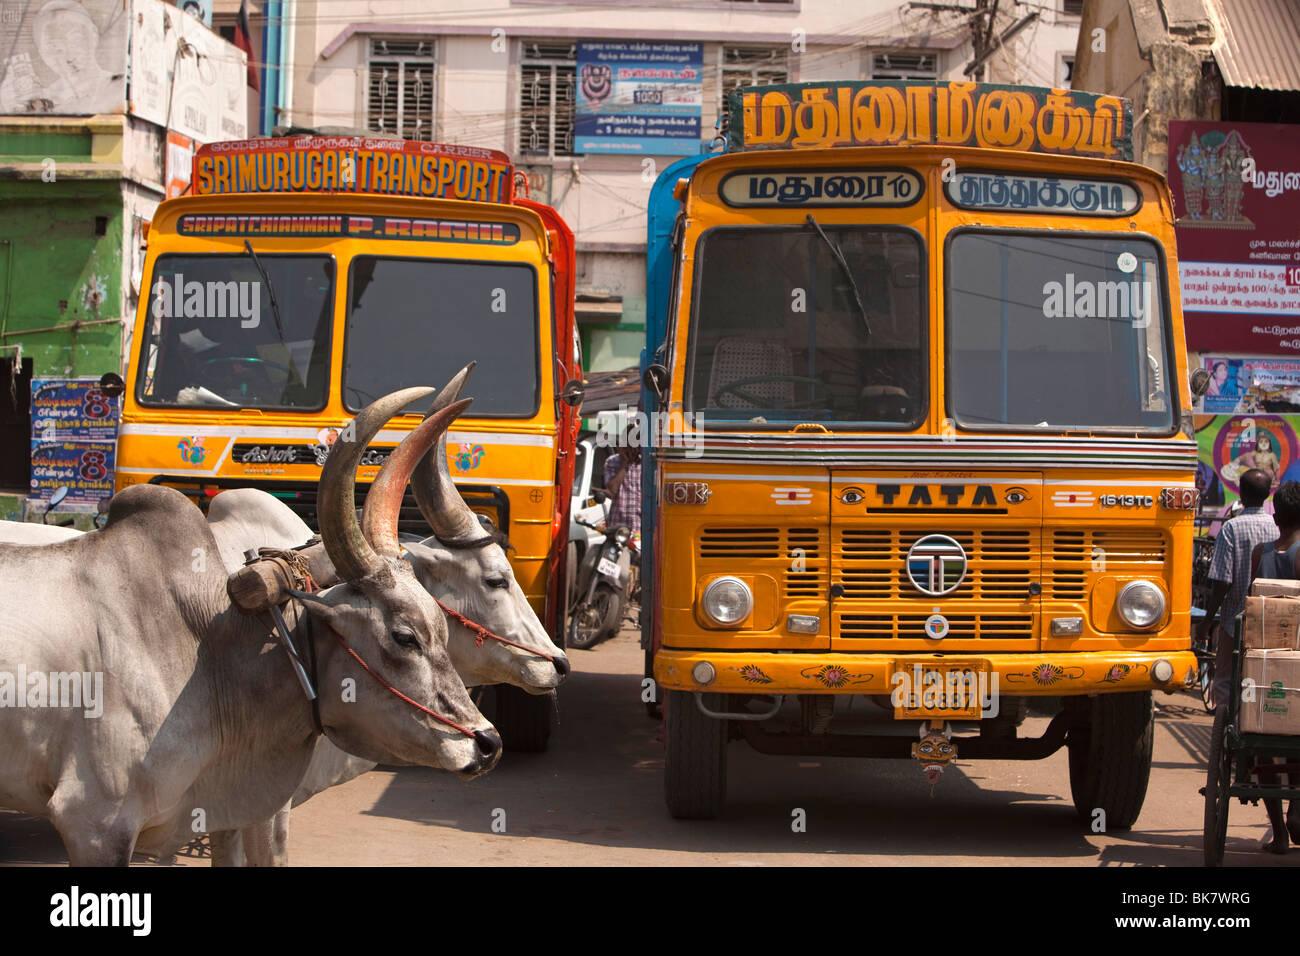 India, Tamil Nadu, Madurai, road traffic, bullock cart passing heavy haulage lorries Stock Photo